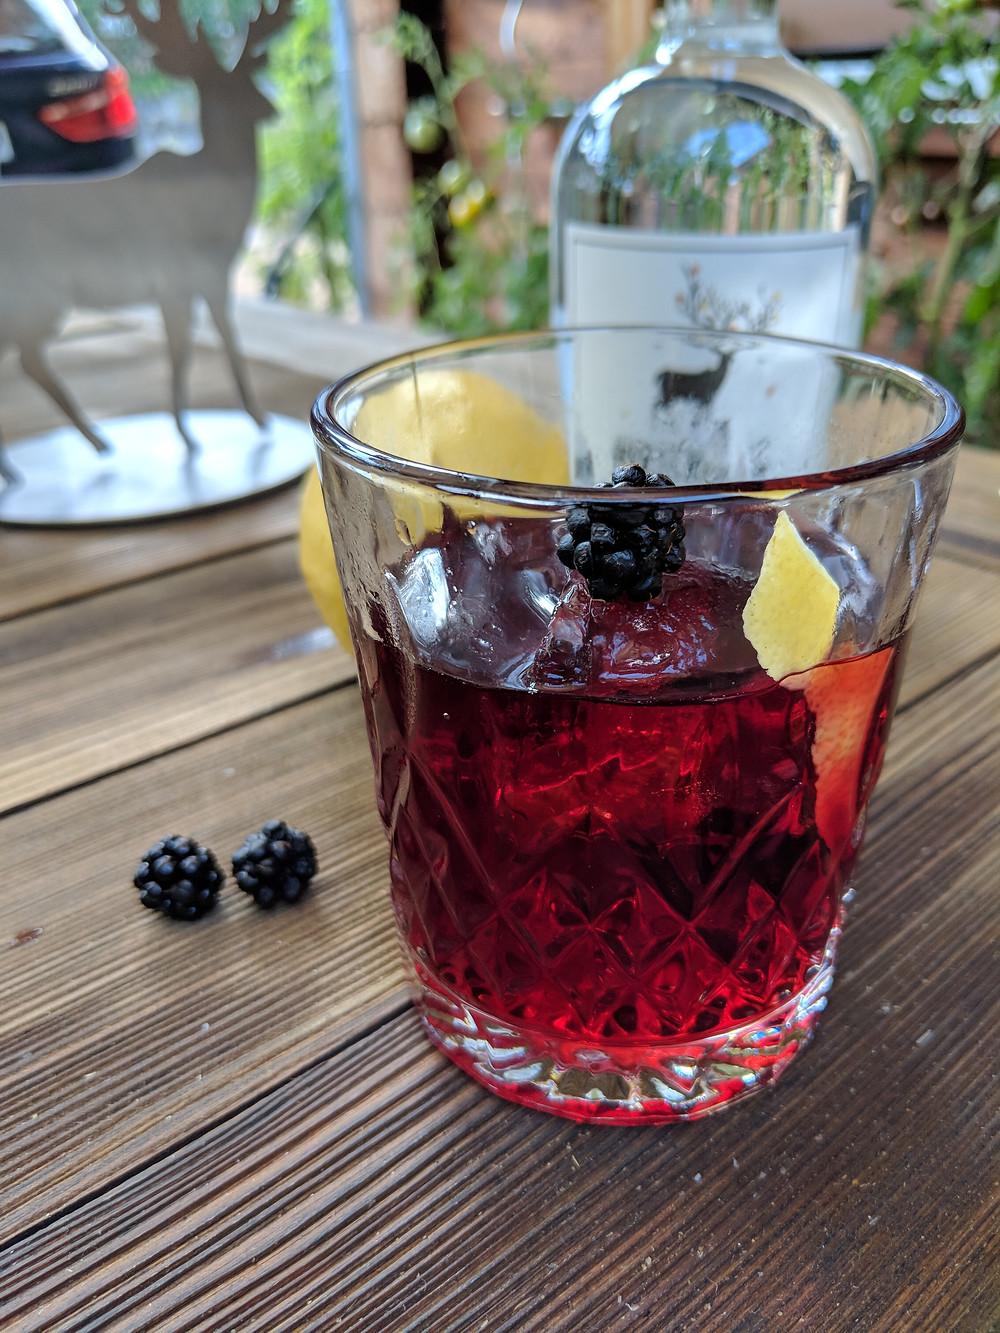 Rhabarber-Rosmarin Gin Tonic mit Van Nahmen Rhabarbersaft